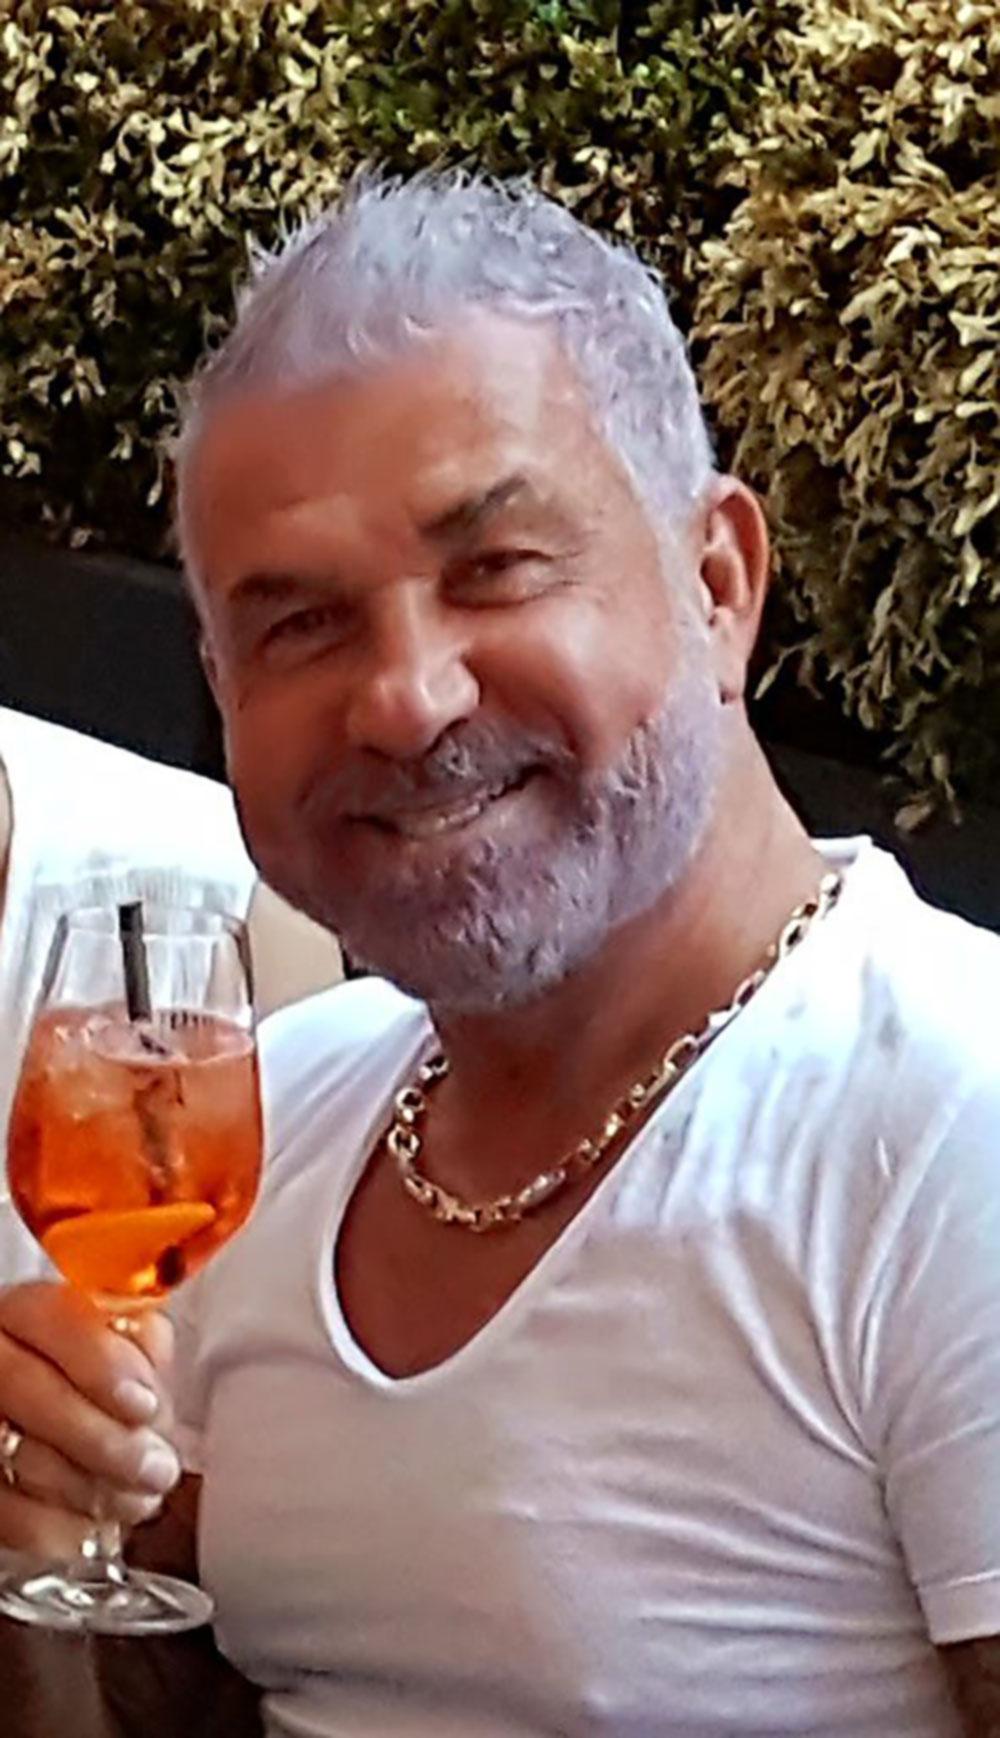 Gino-Storelli_Frisoerabschnitt